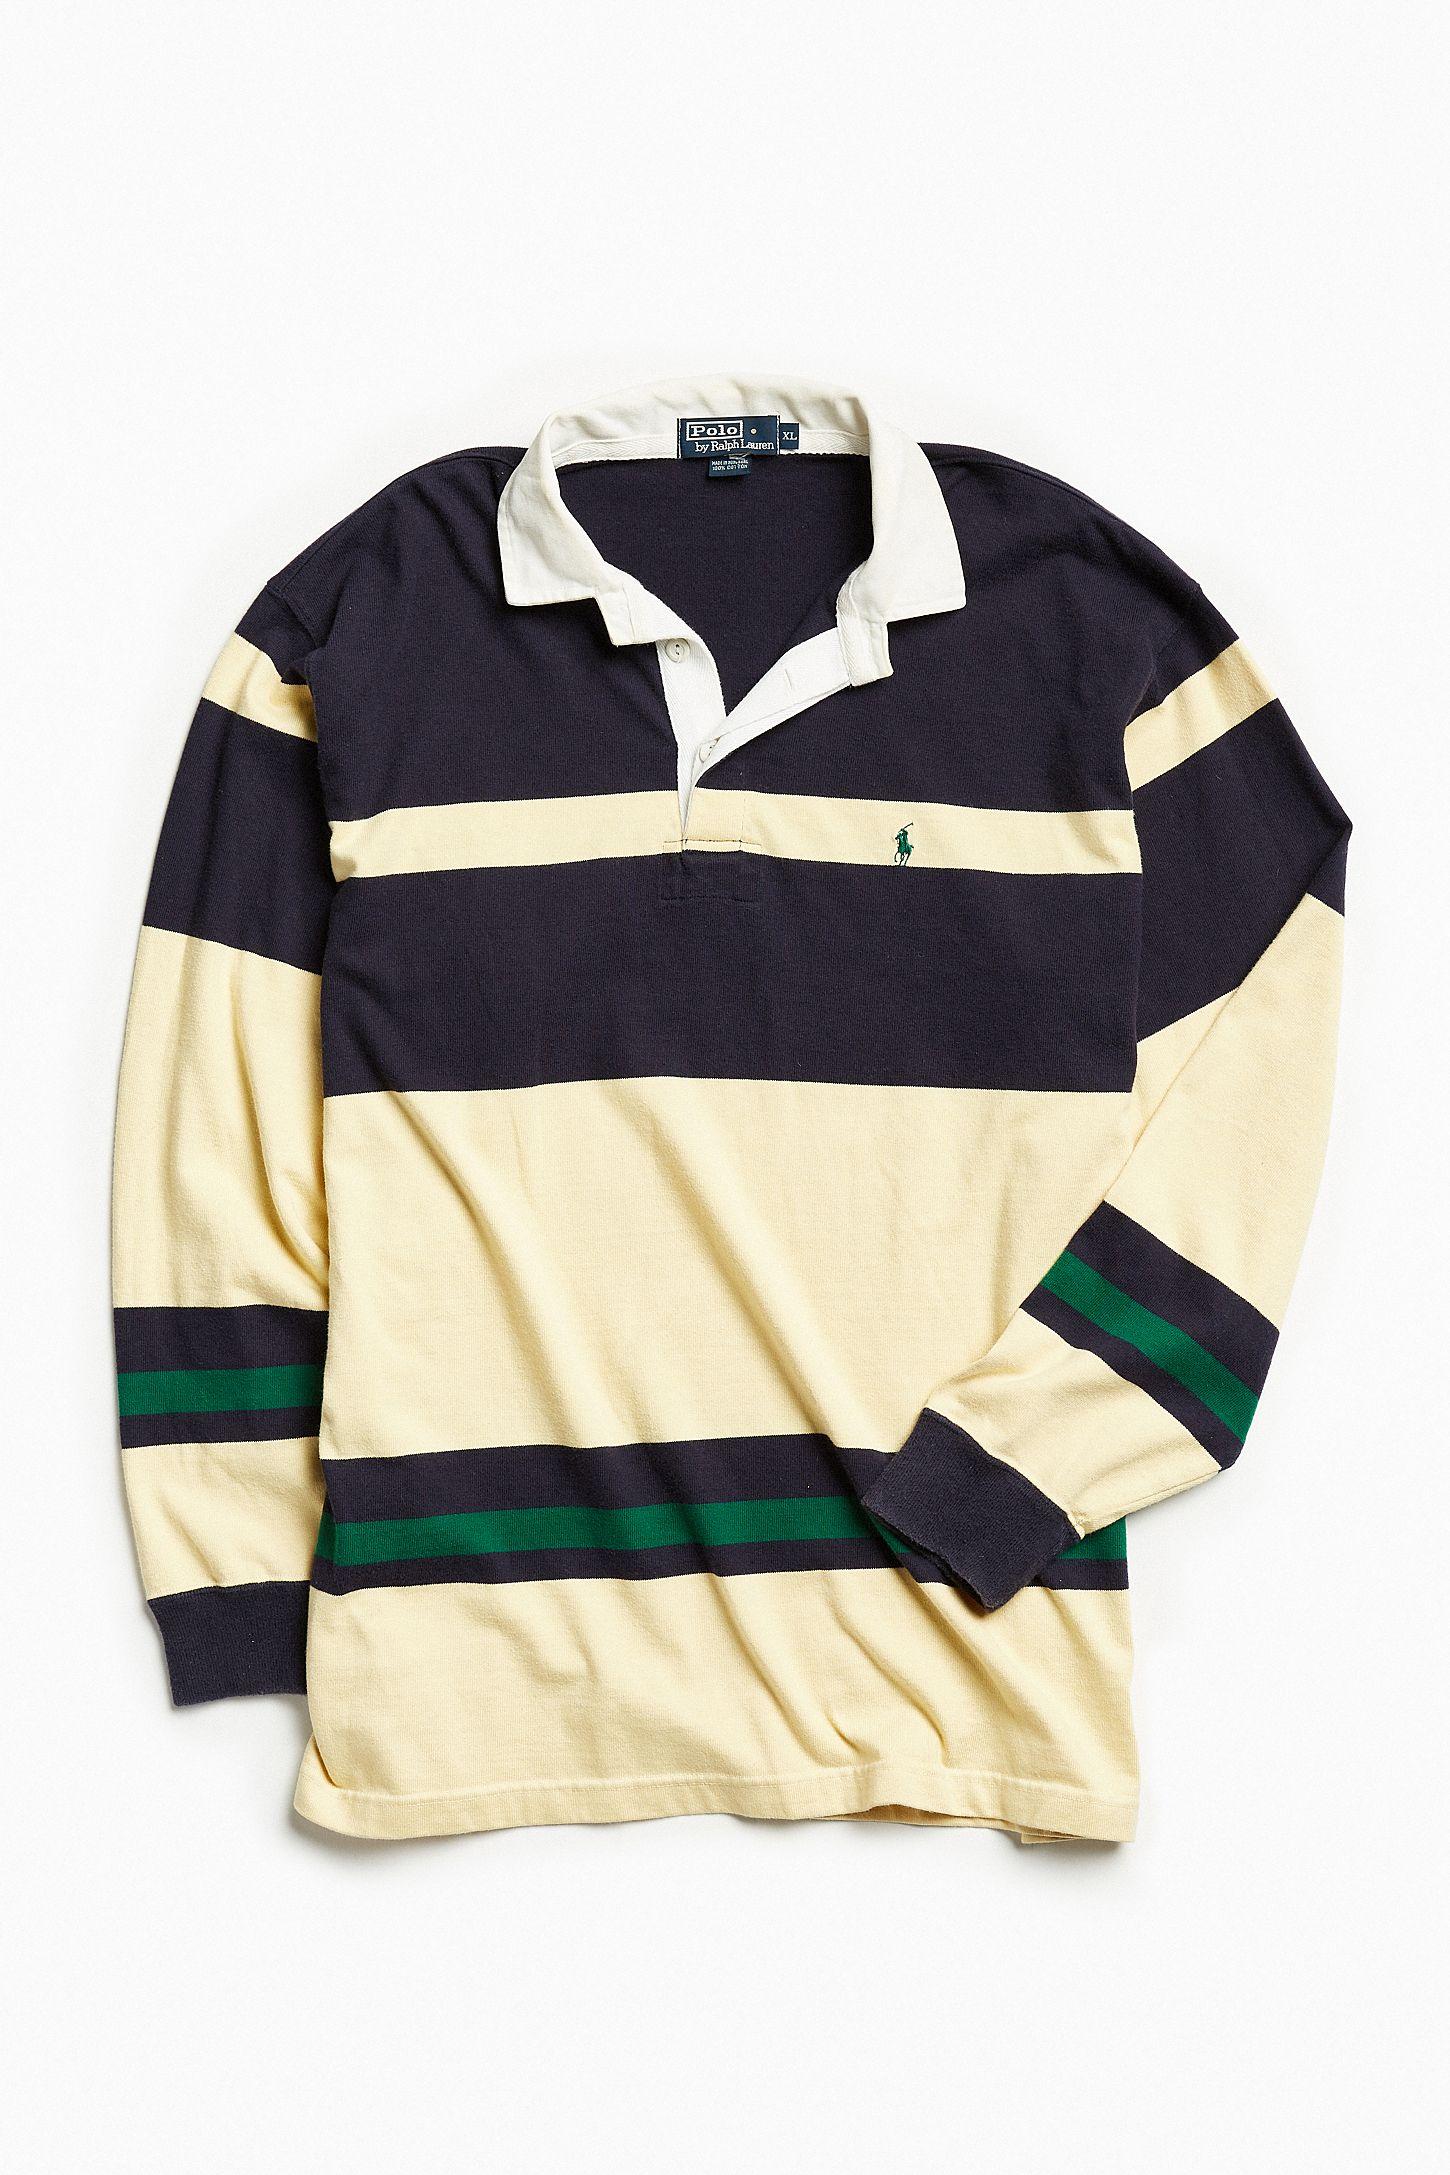 68c5fef142c Vintage Polo Ralph Lauren Yellow + Navy Stripe Rugby Shirt | Urban ...